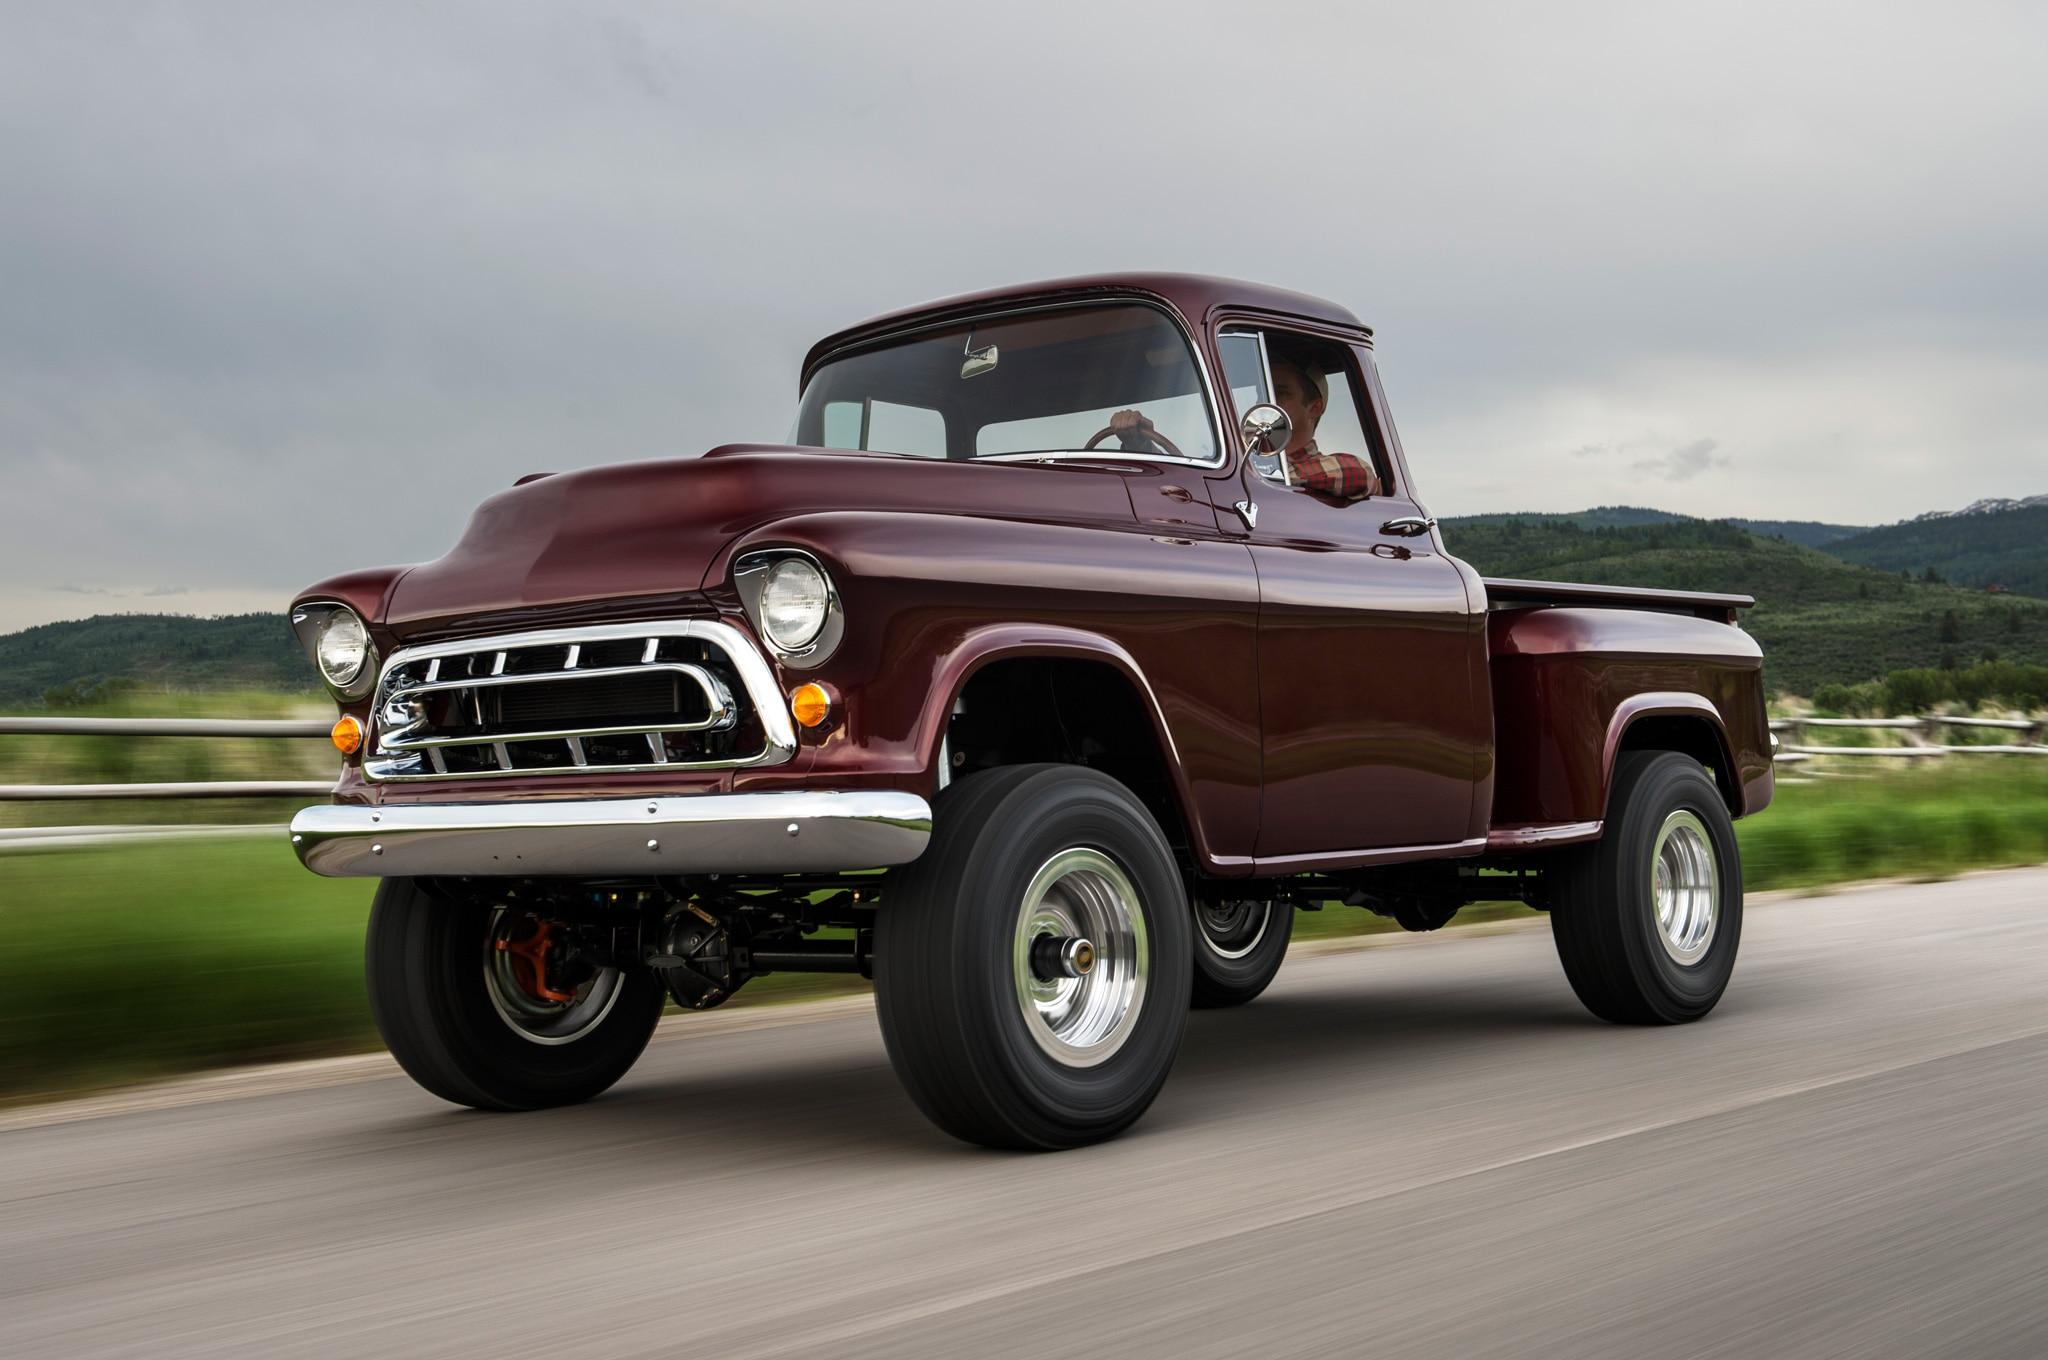 1957 chevrolet task force napco legacy classic trucks front three quarter